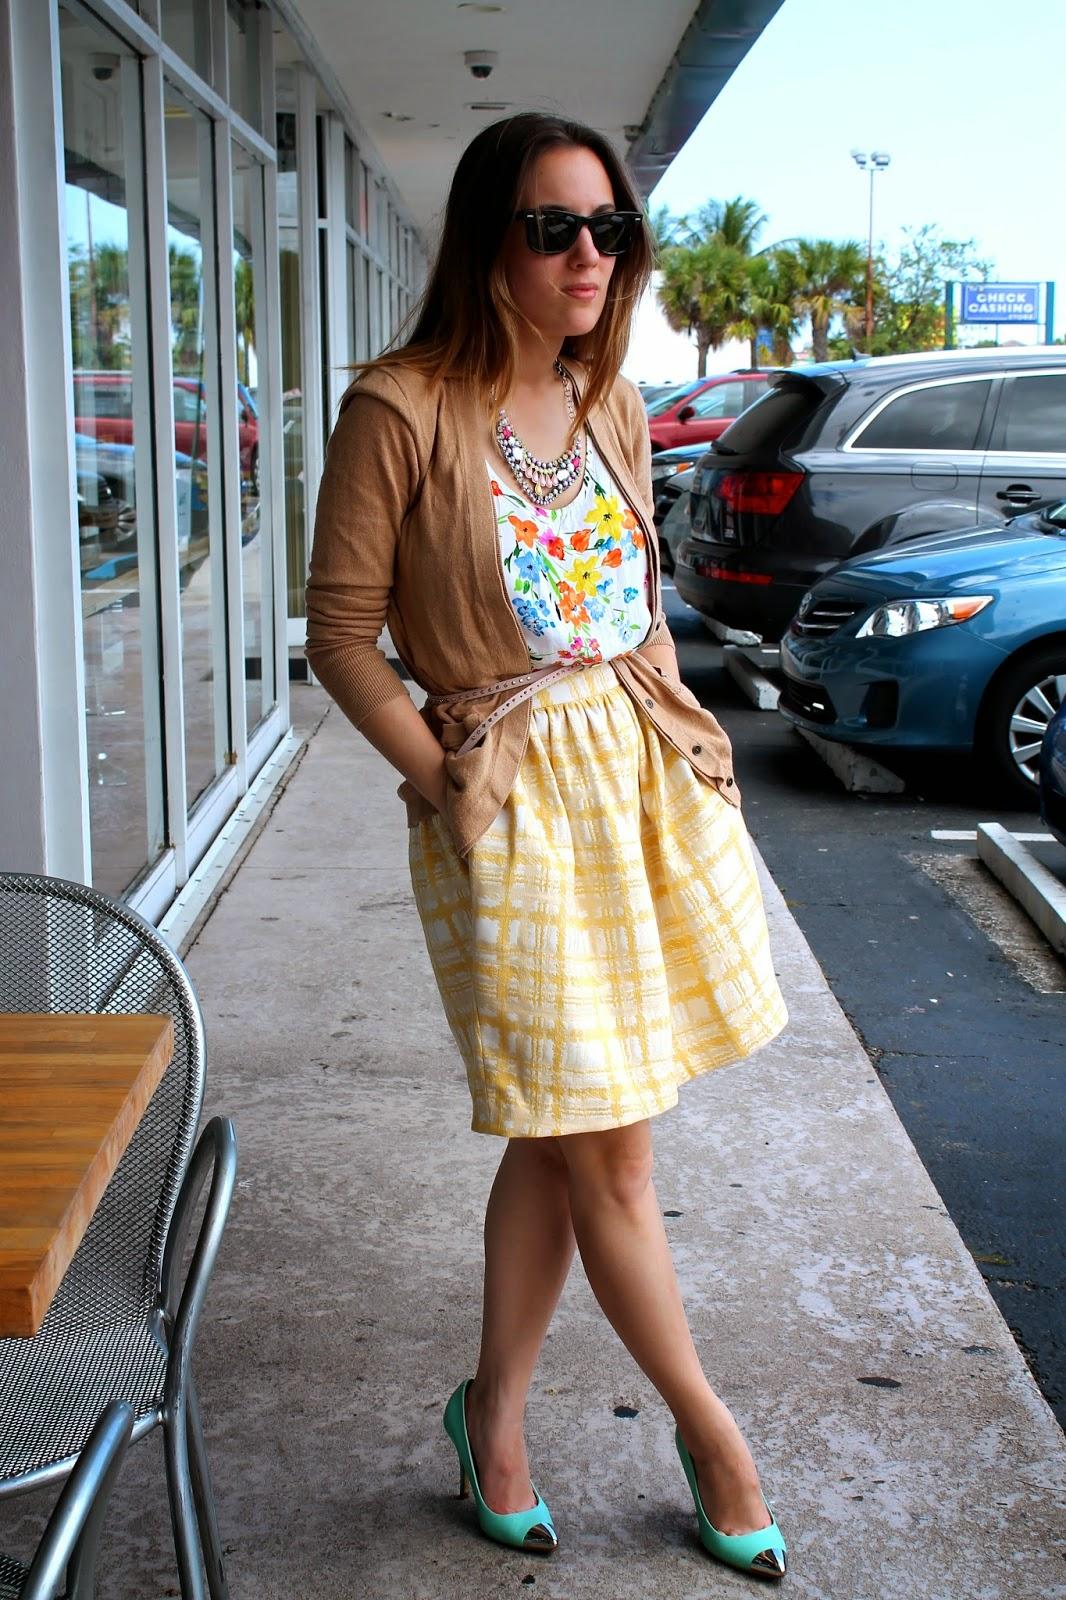 J.Crew, Nordstrom, Forever 21, LOFT, prep, fashion, what i wore, ootd, feminine, romantic, floral, plaid, Miami, Miami fashion